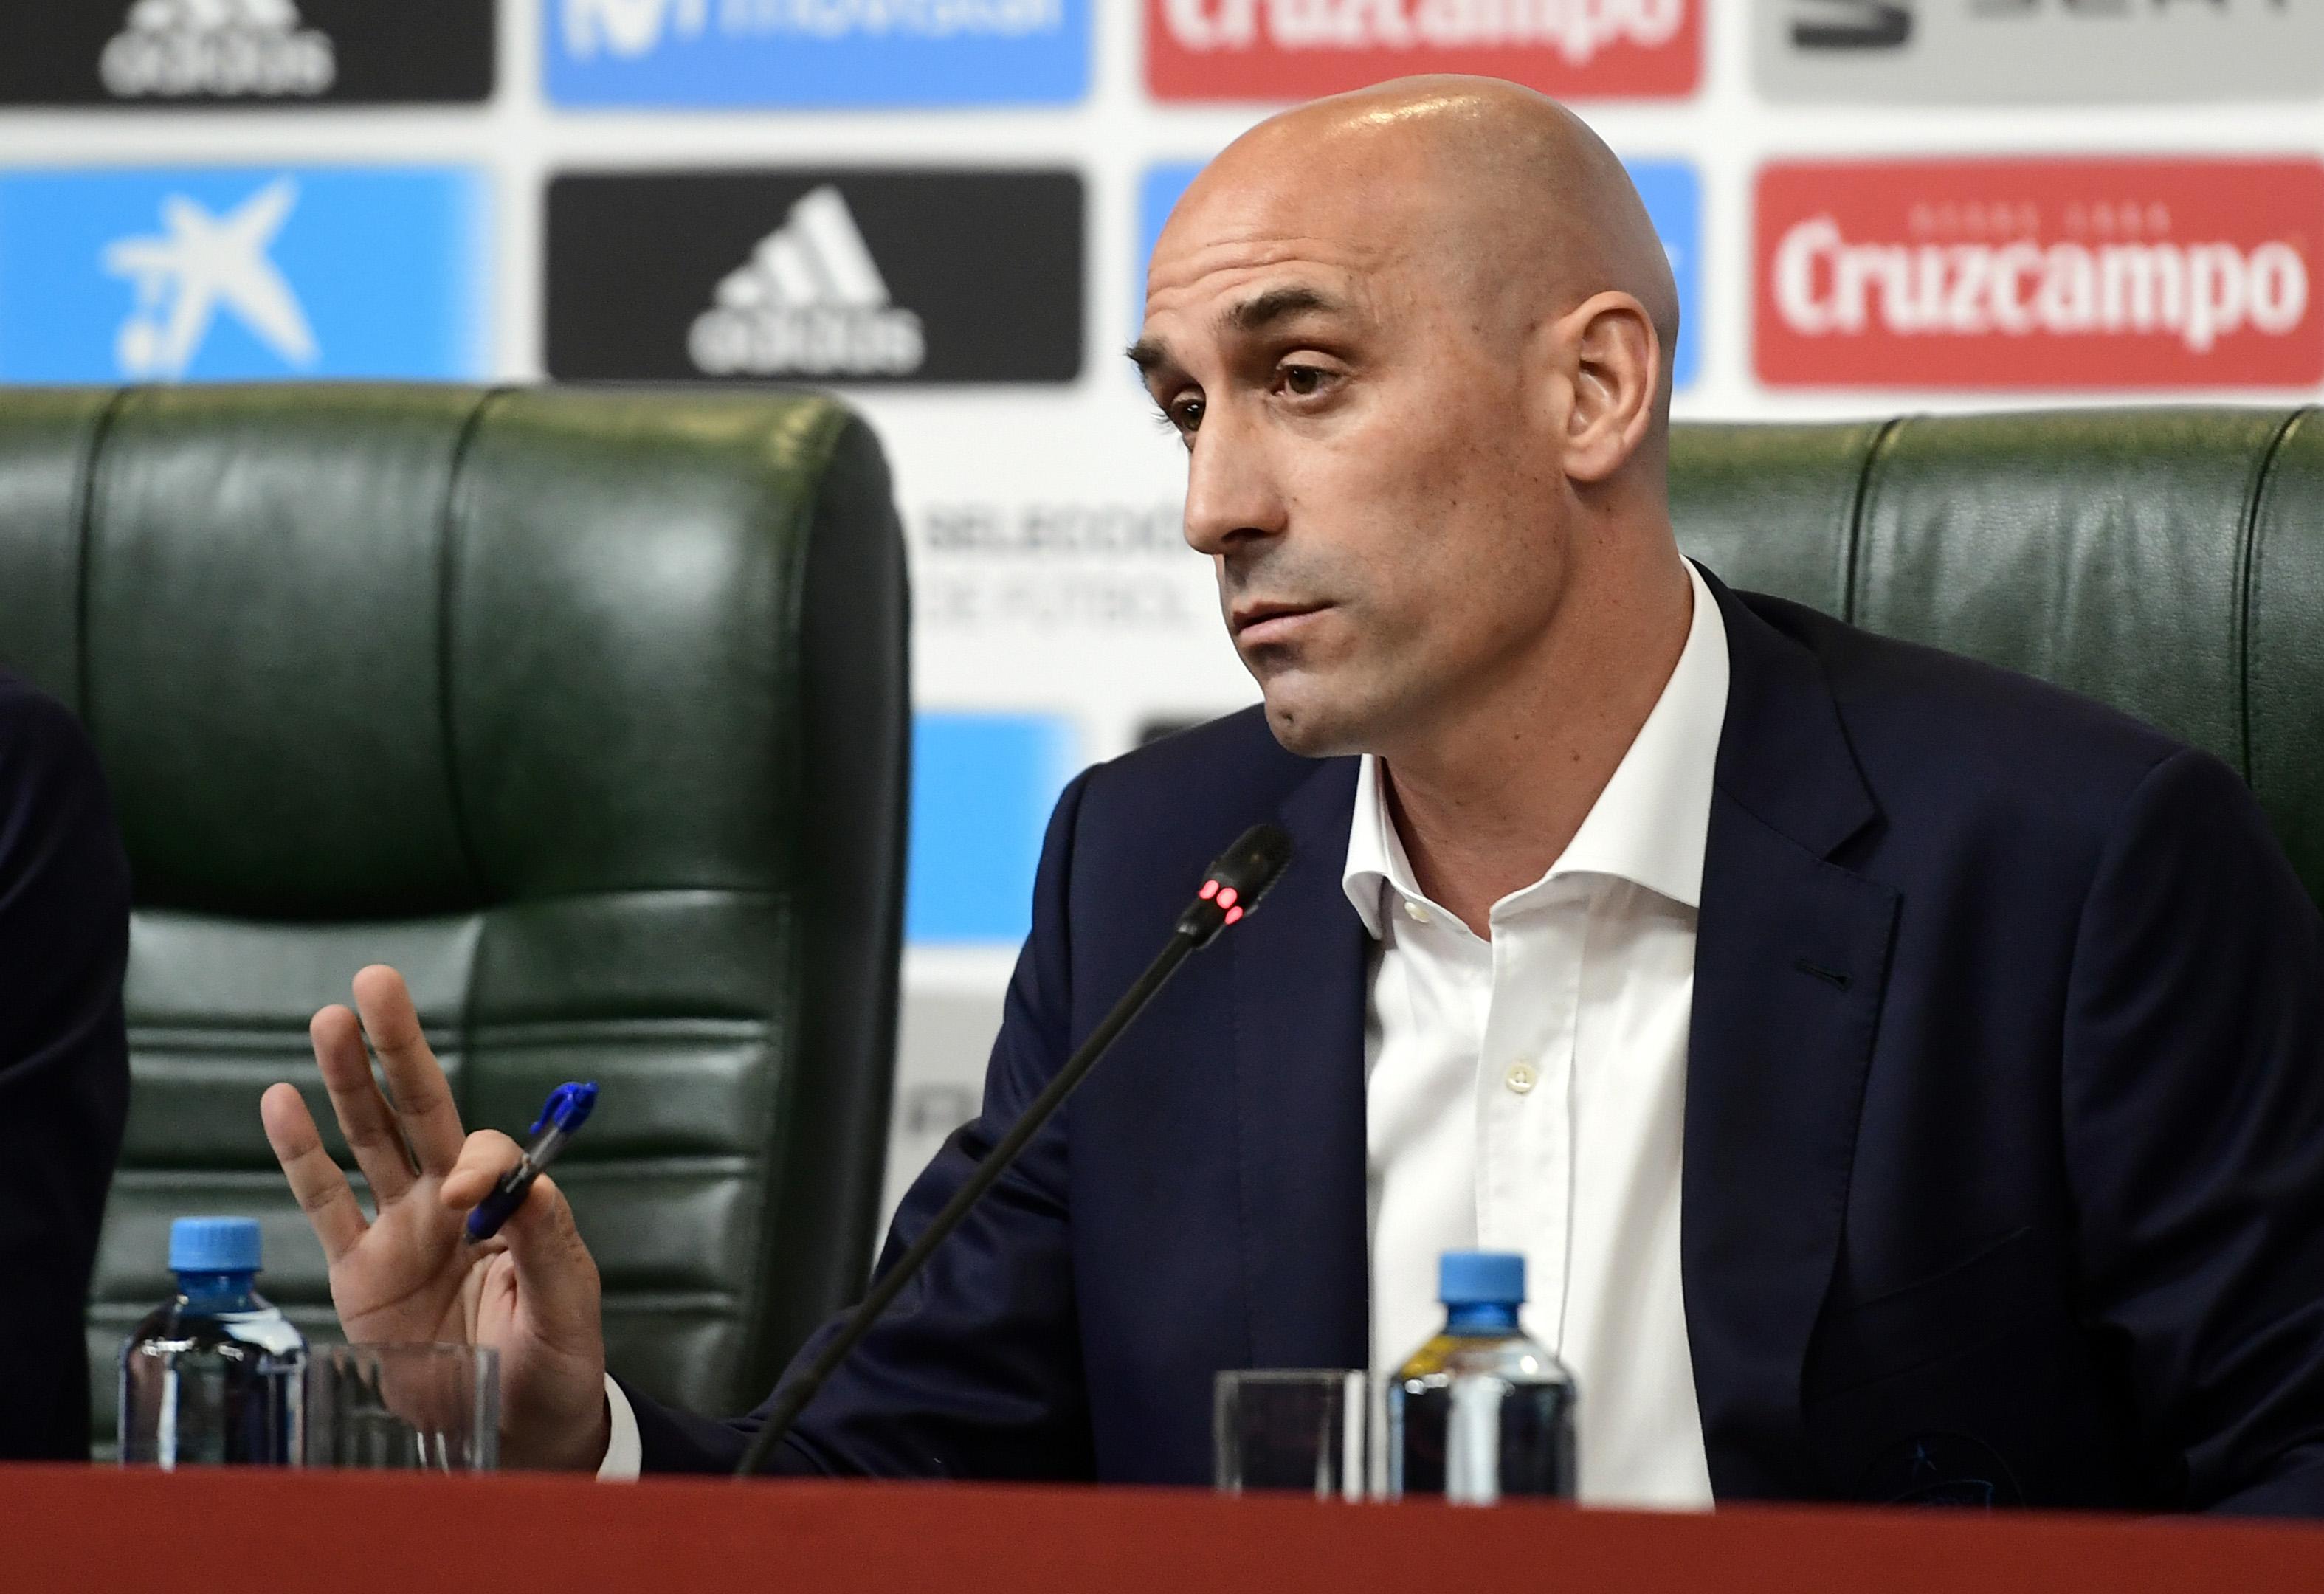 Image result for สเปนพลาดโหวตเจ้าภาพบอลโลก 2026